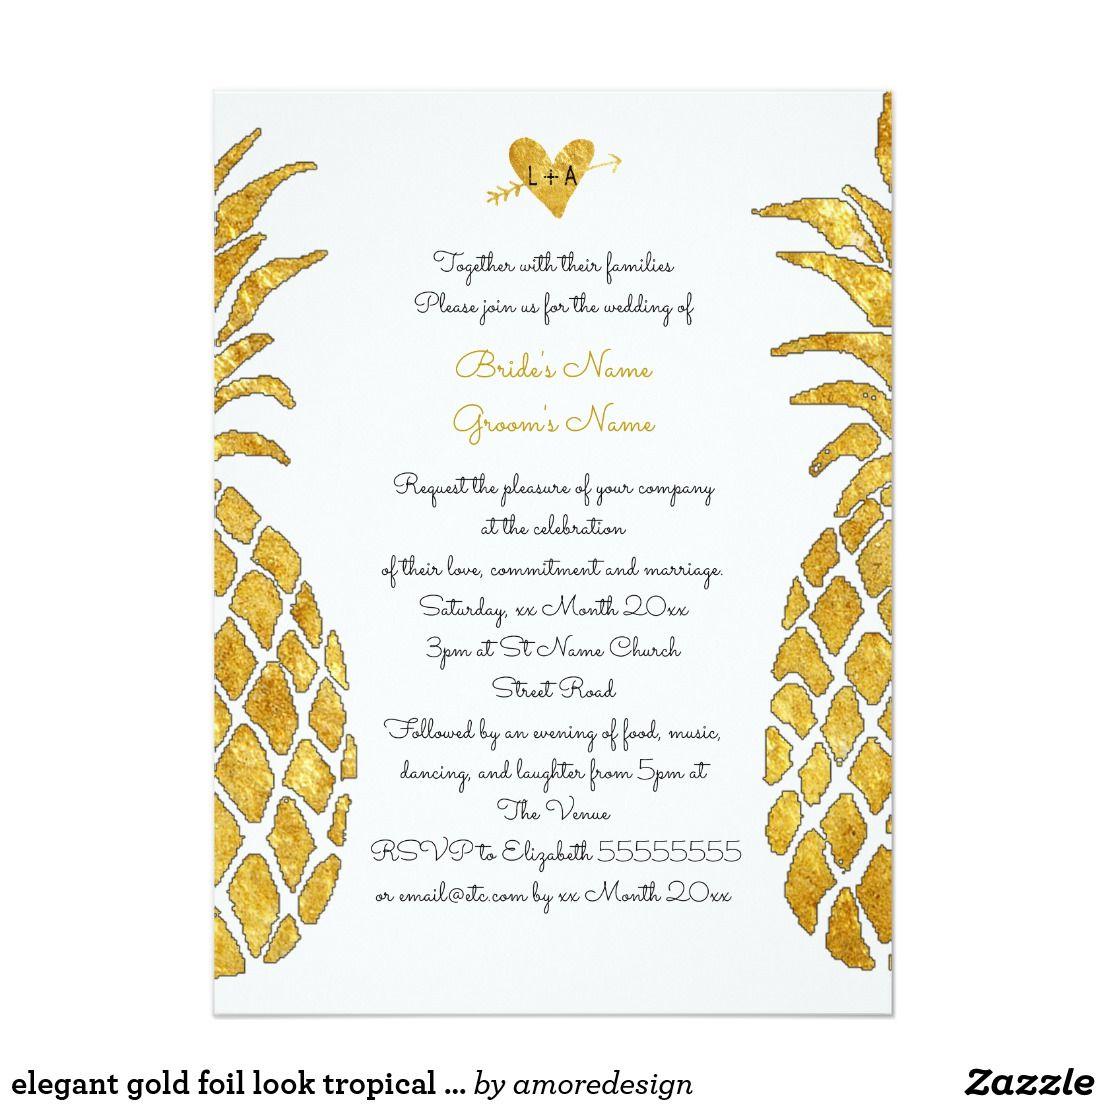 elegant gold foil look tropical summer wedding